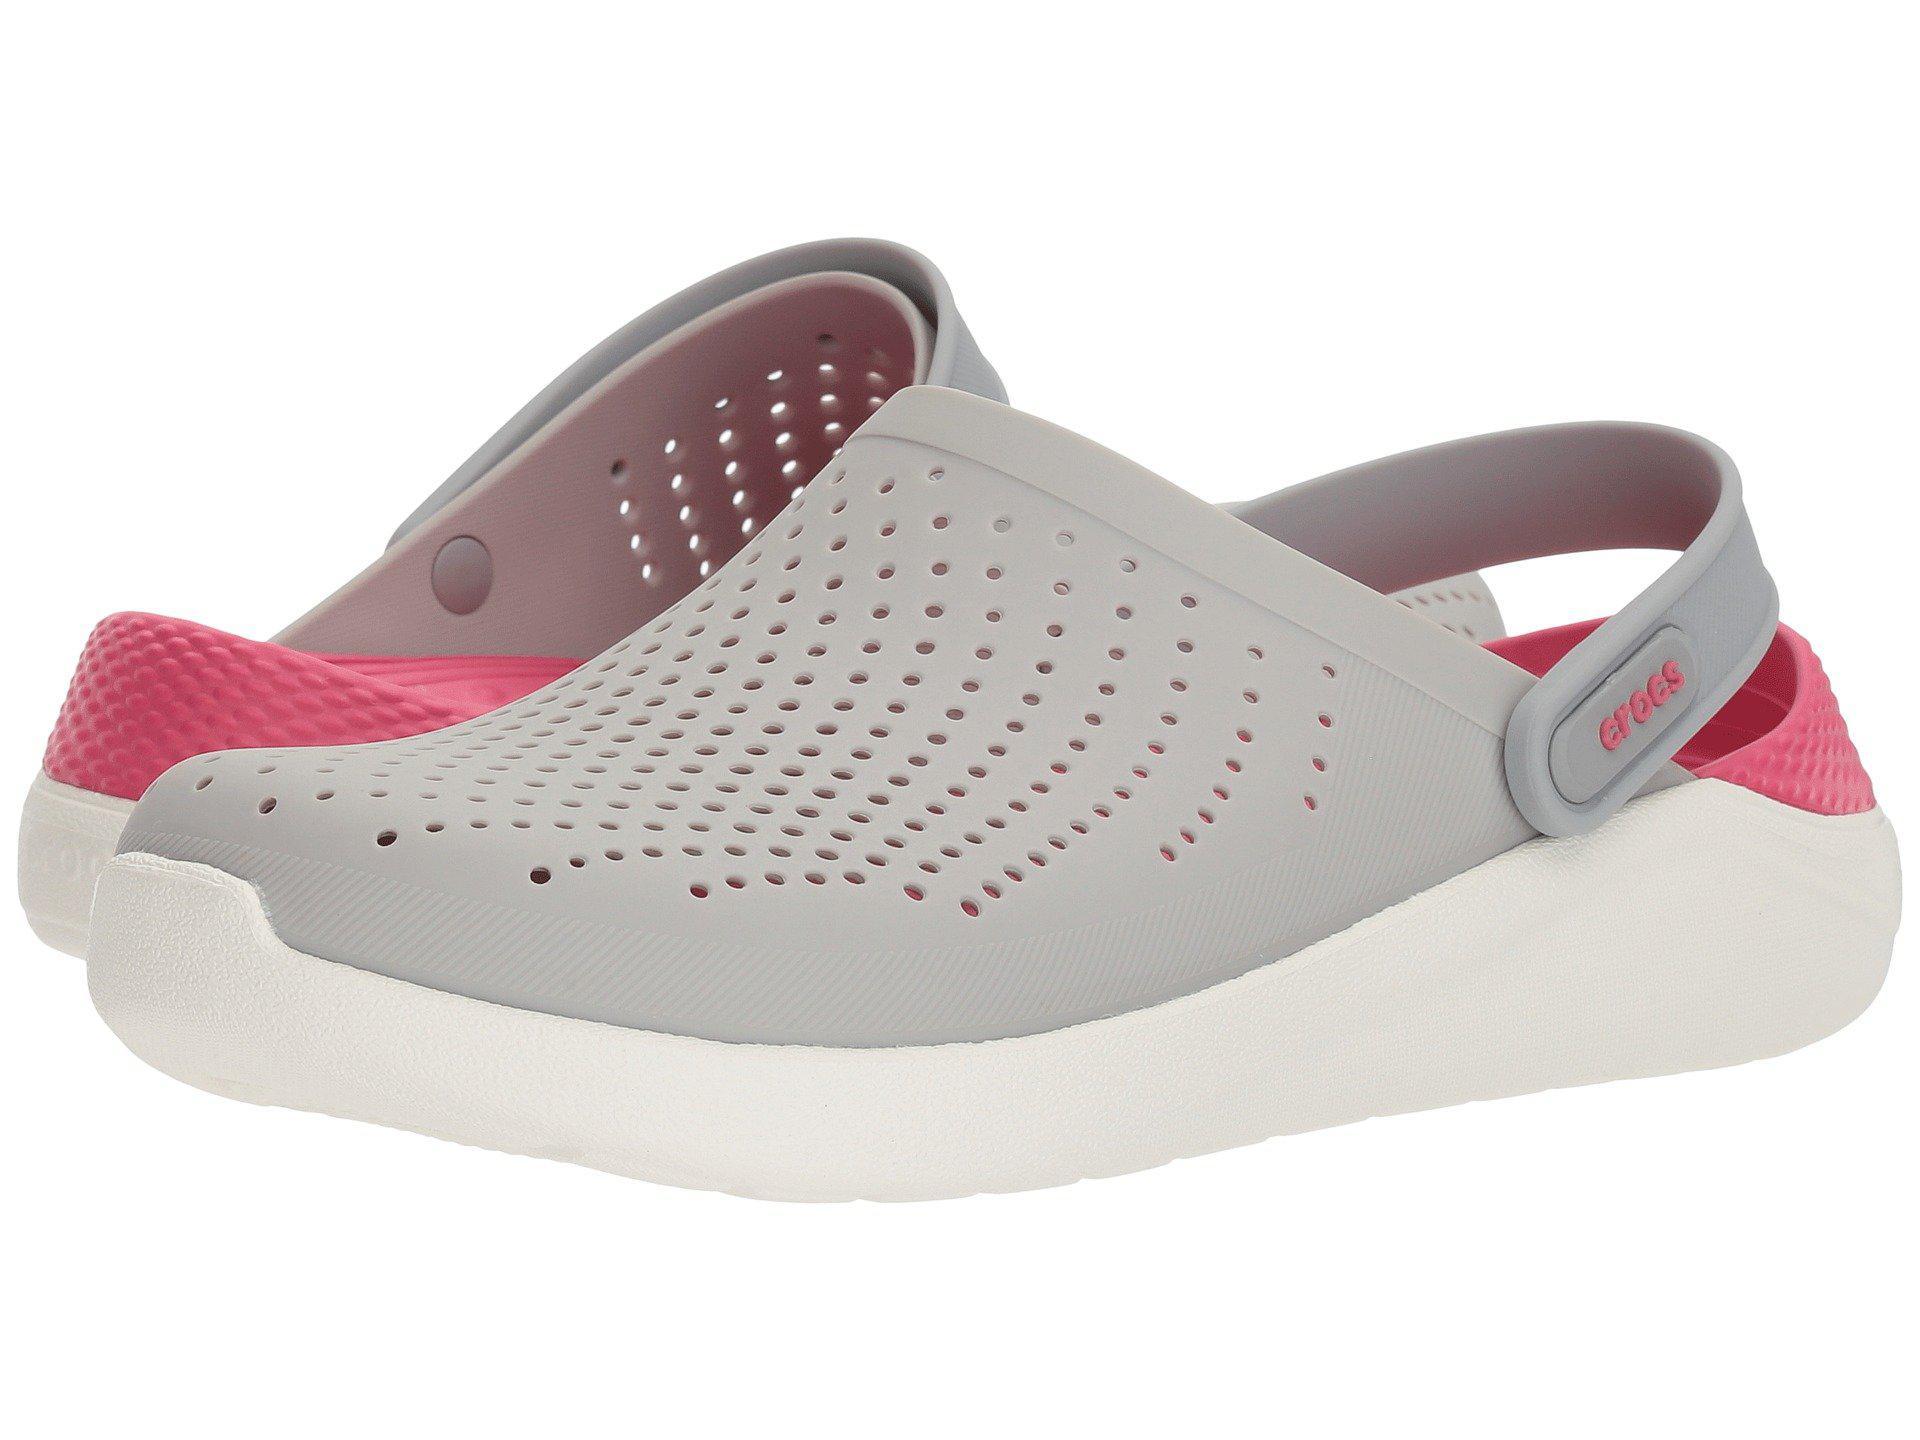 12e02c05c33b92 Lyst - Crocs™ Literide Clog in White - Save 29%